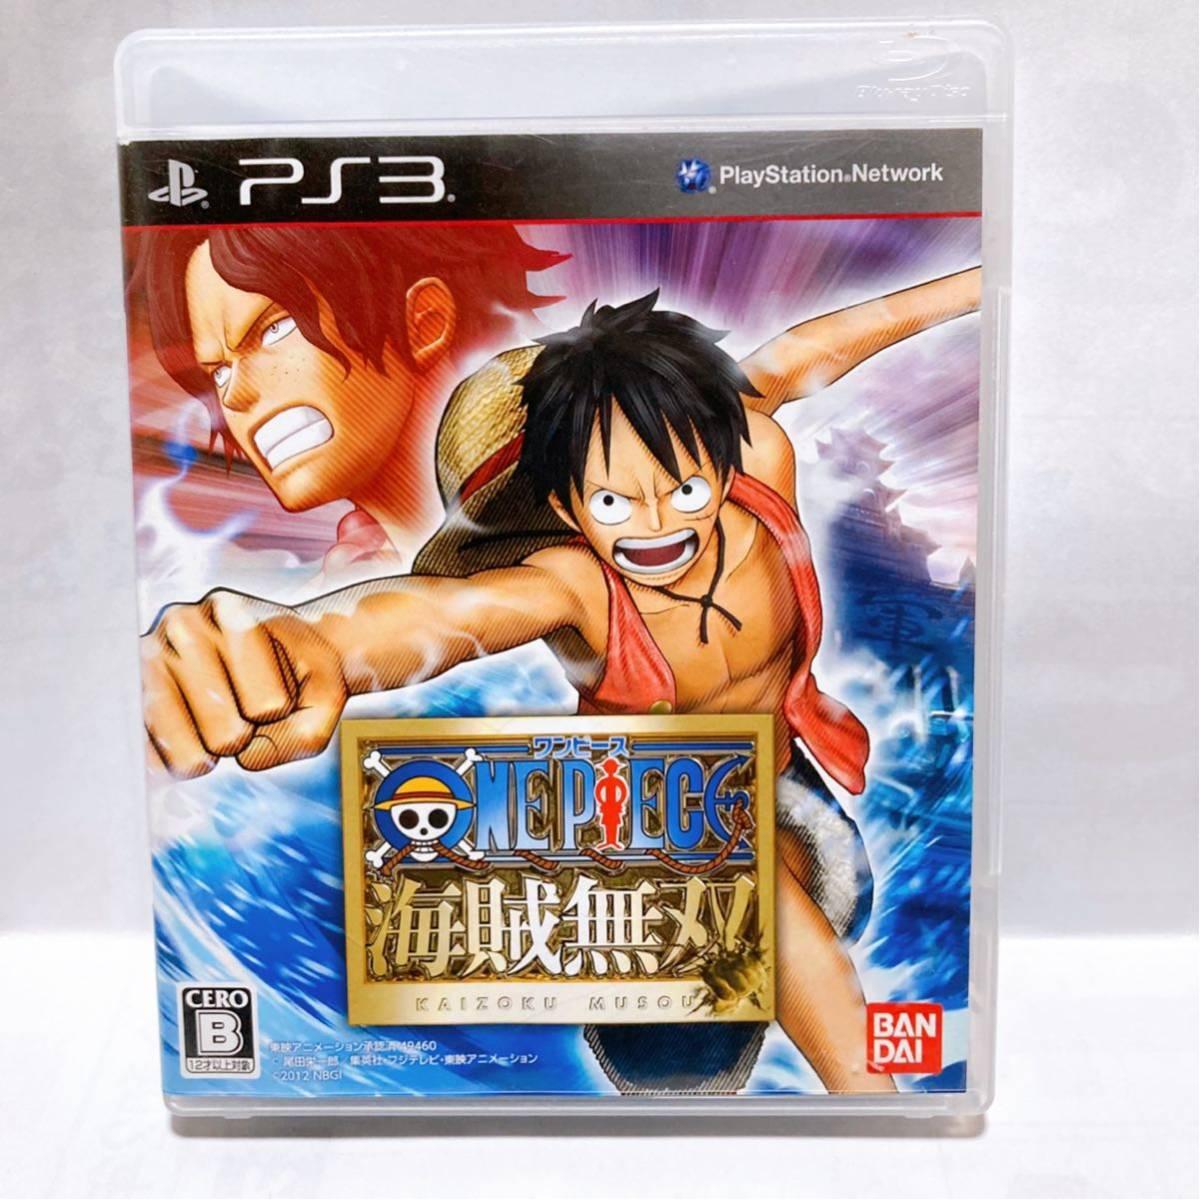 PS3 ワンピース海賊無双 【プレイステーション3 プレステ3 ONEPIECE】